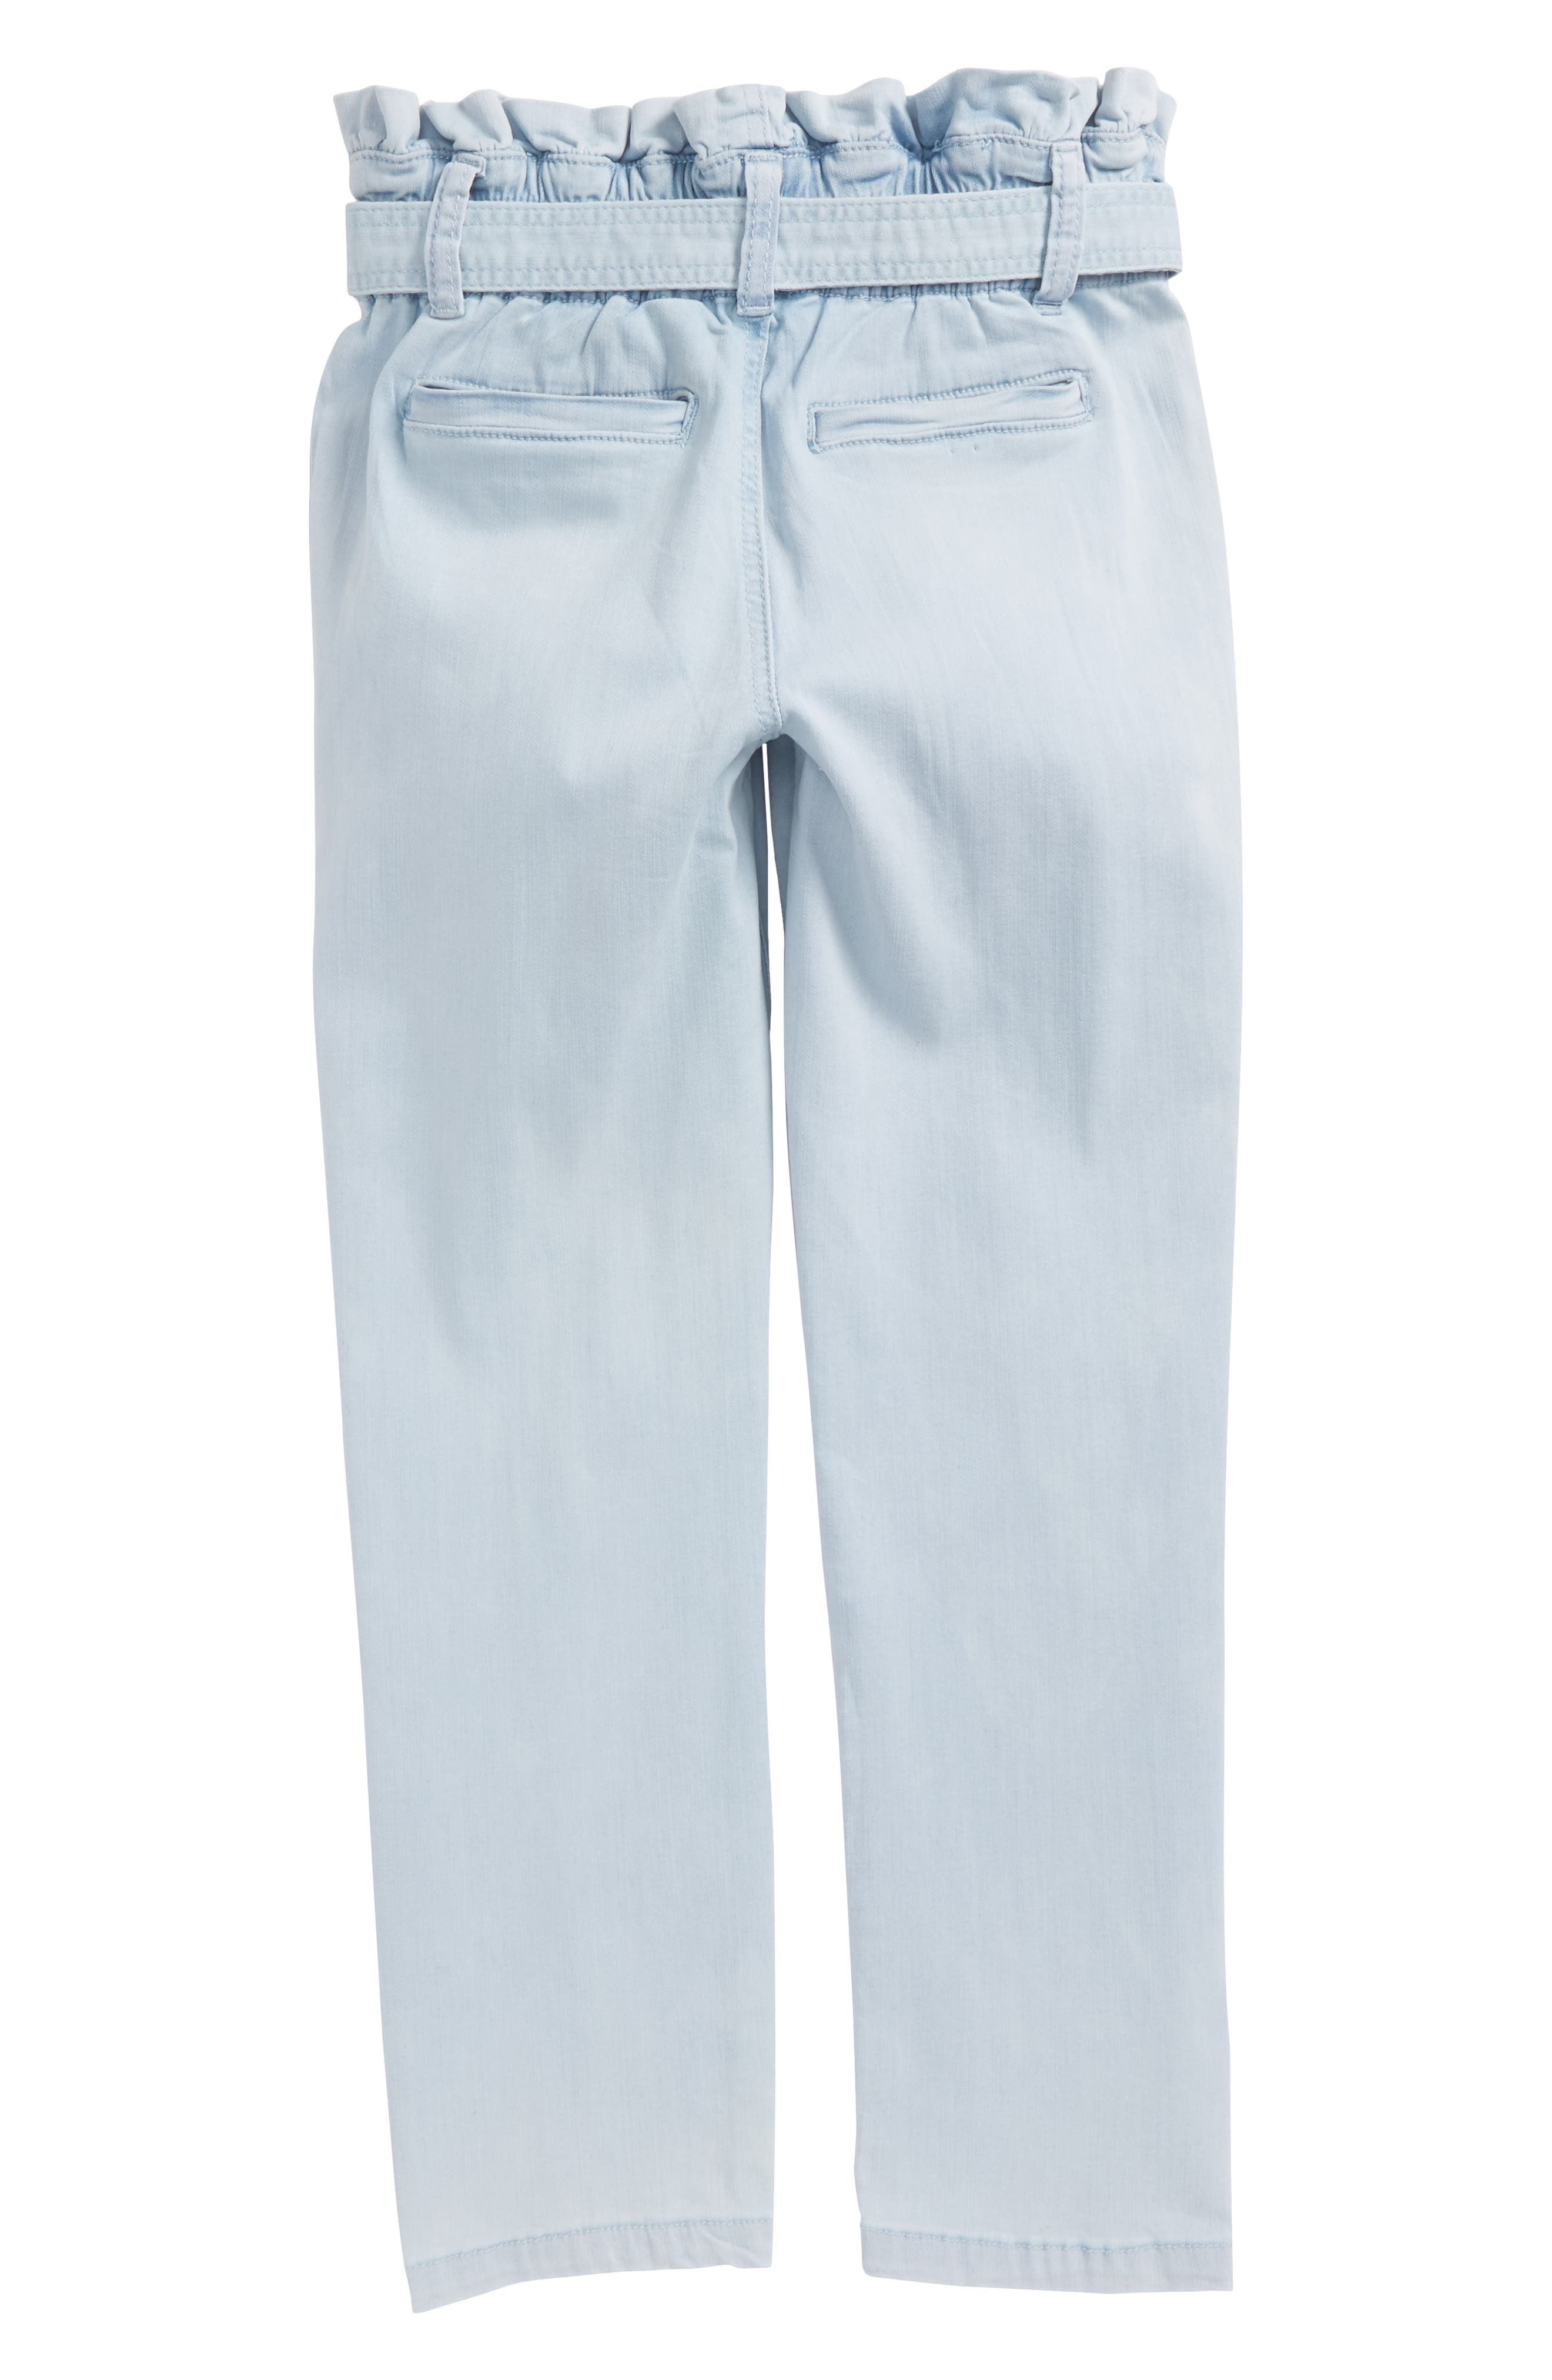 Alternate Image 2  - ag adriano goldschmied kids Paper Bag Crop Pants (Big Girls)